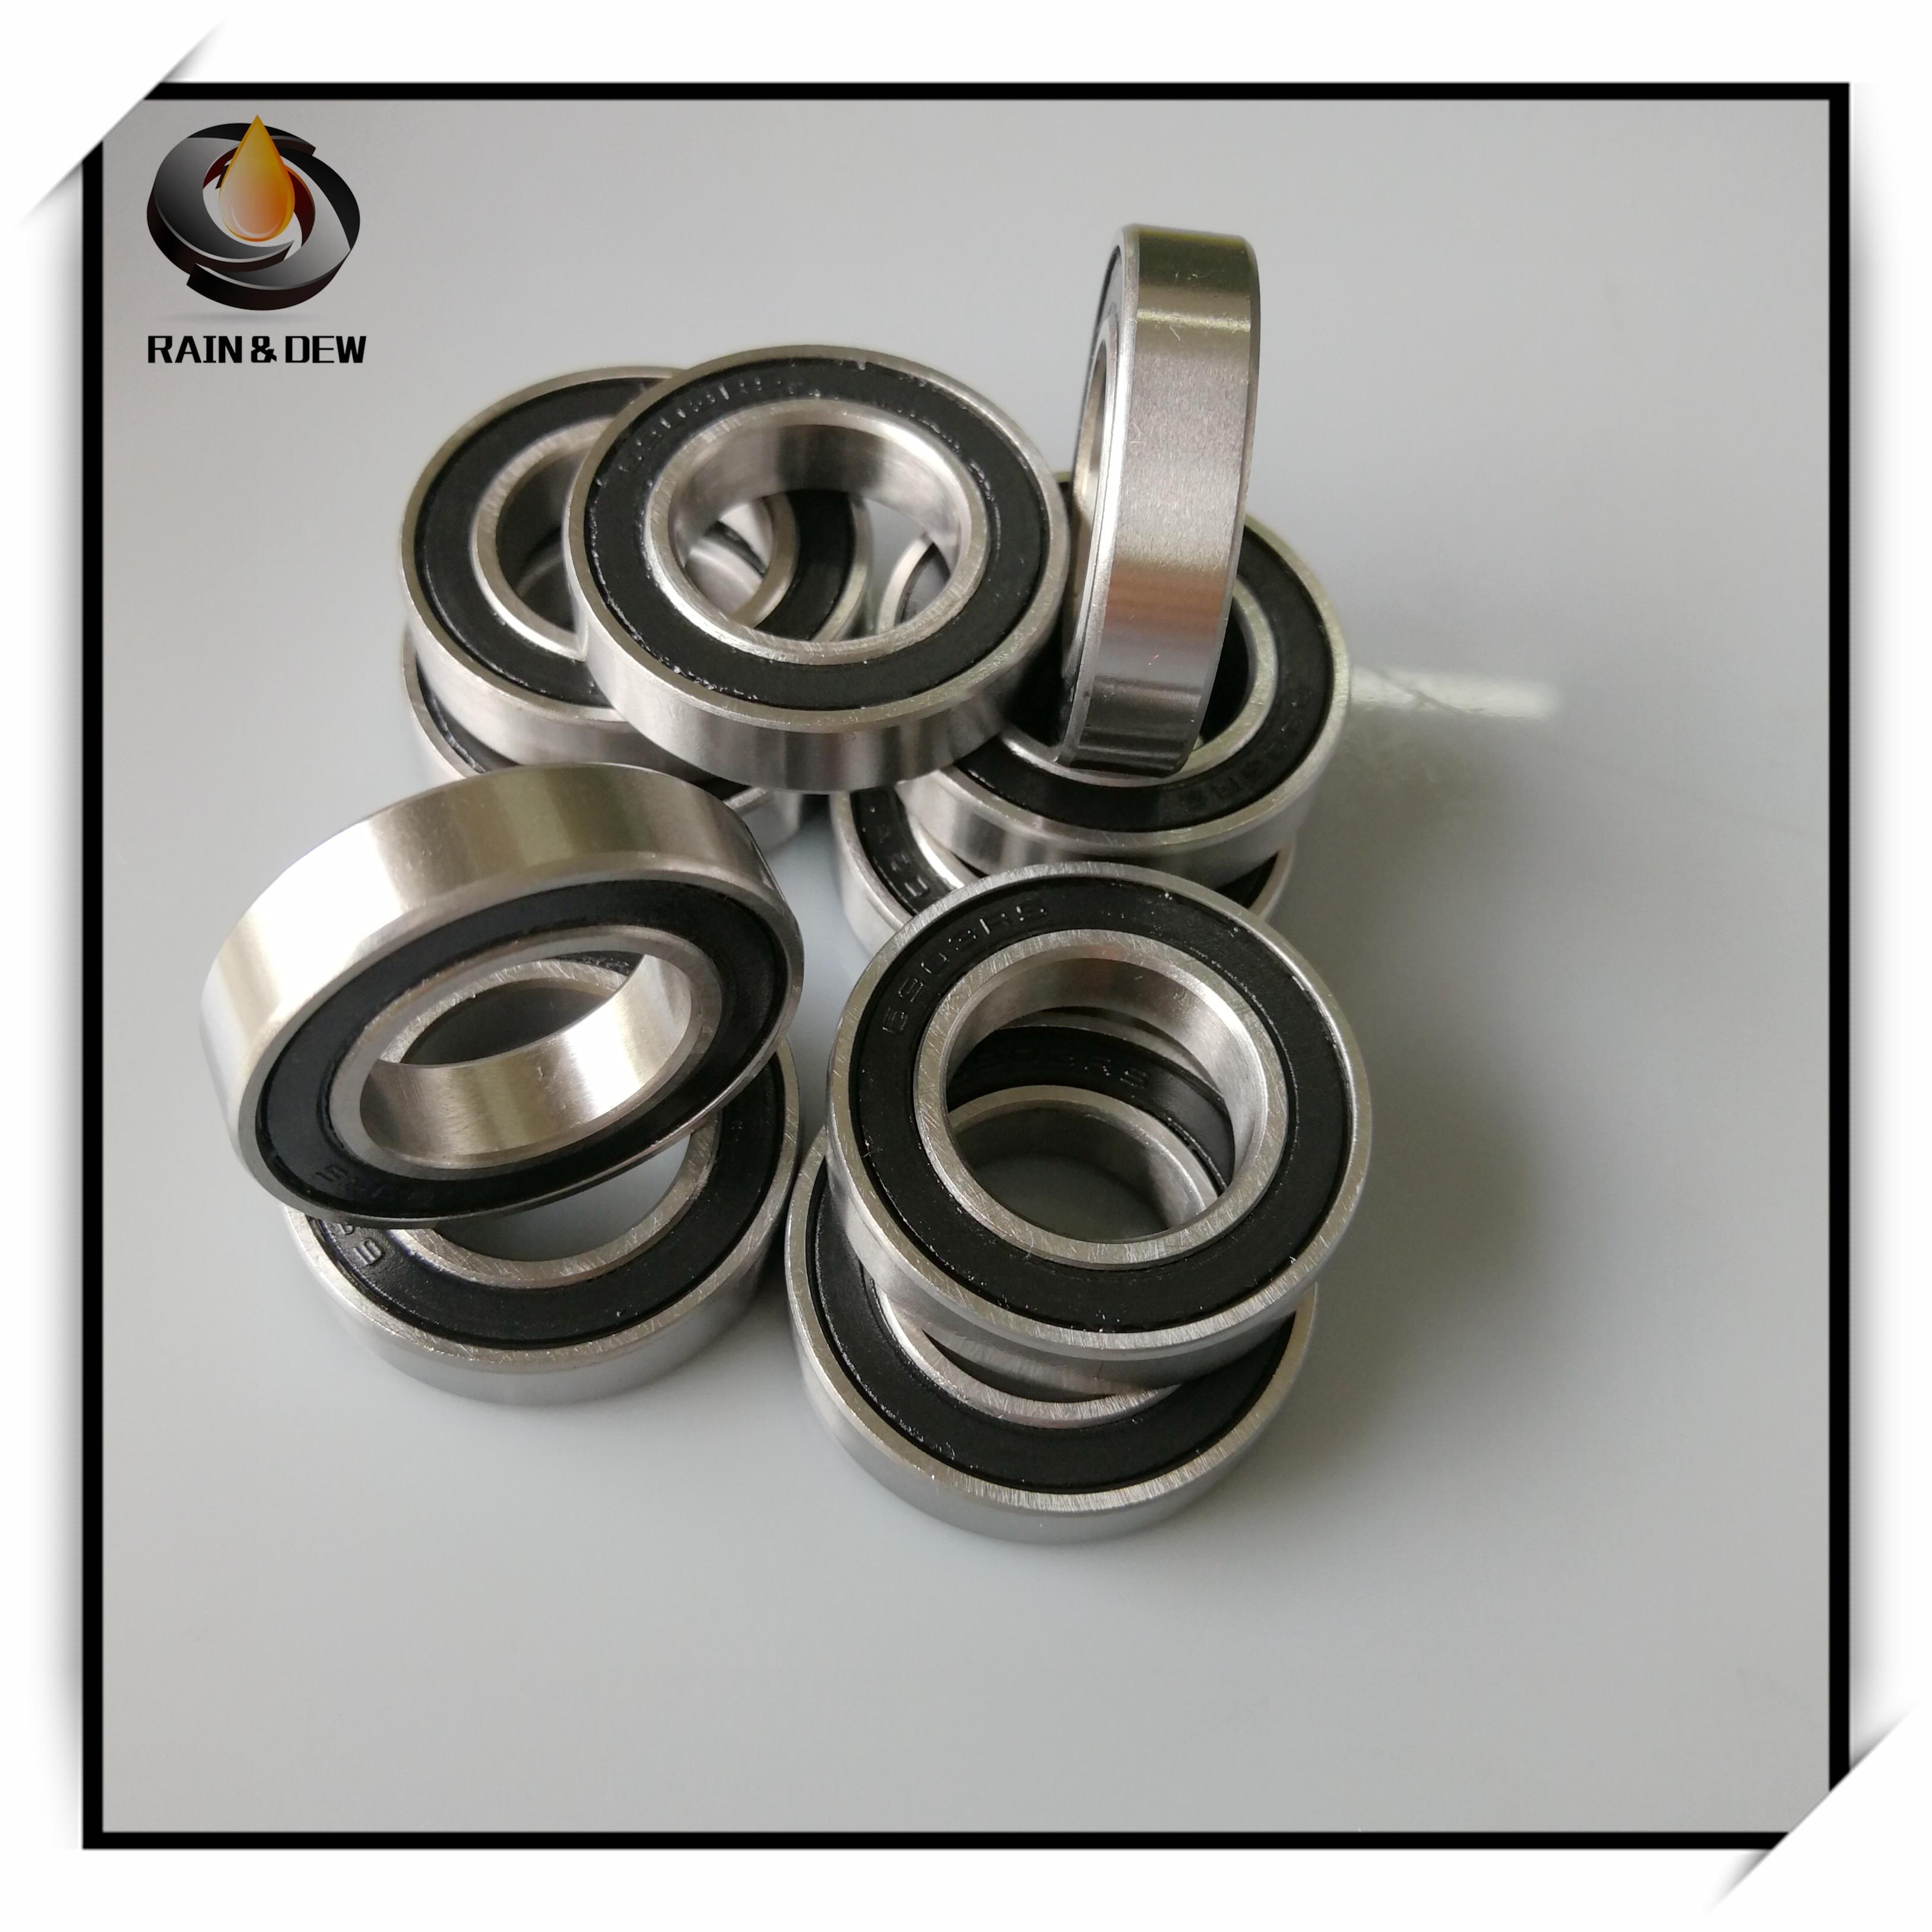 1Pcs 6903 6903-2RS 61903 Hybrid Ceramic Bearing 17x30x7 mm ABEC-7 For Bicycle Bottom Brackets 6903RS Si3N4 Ball